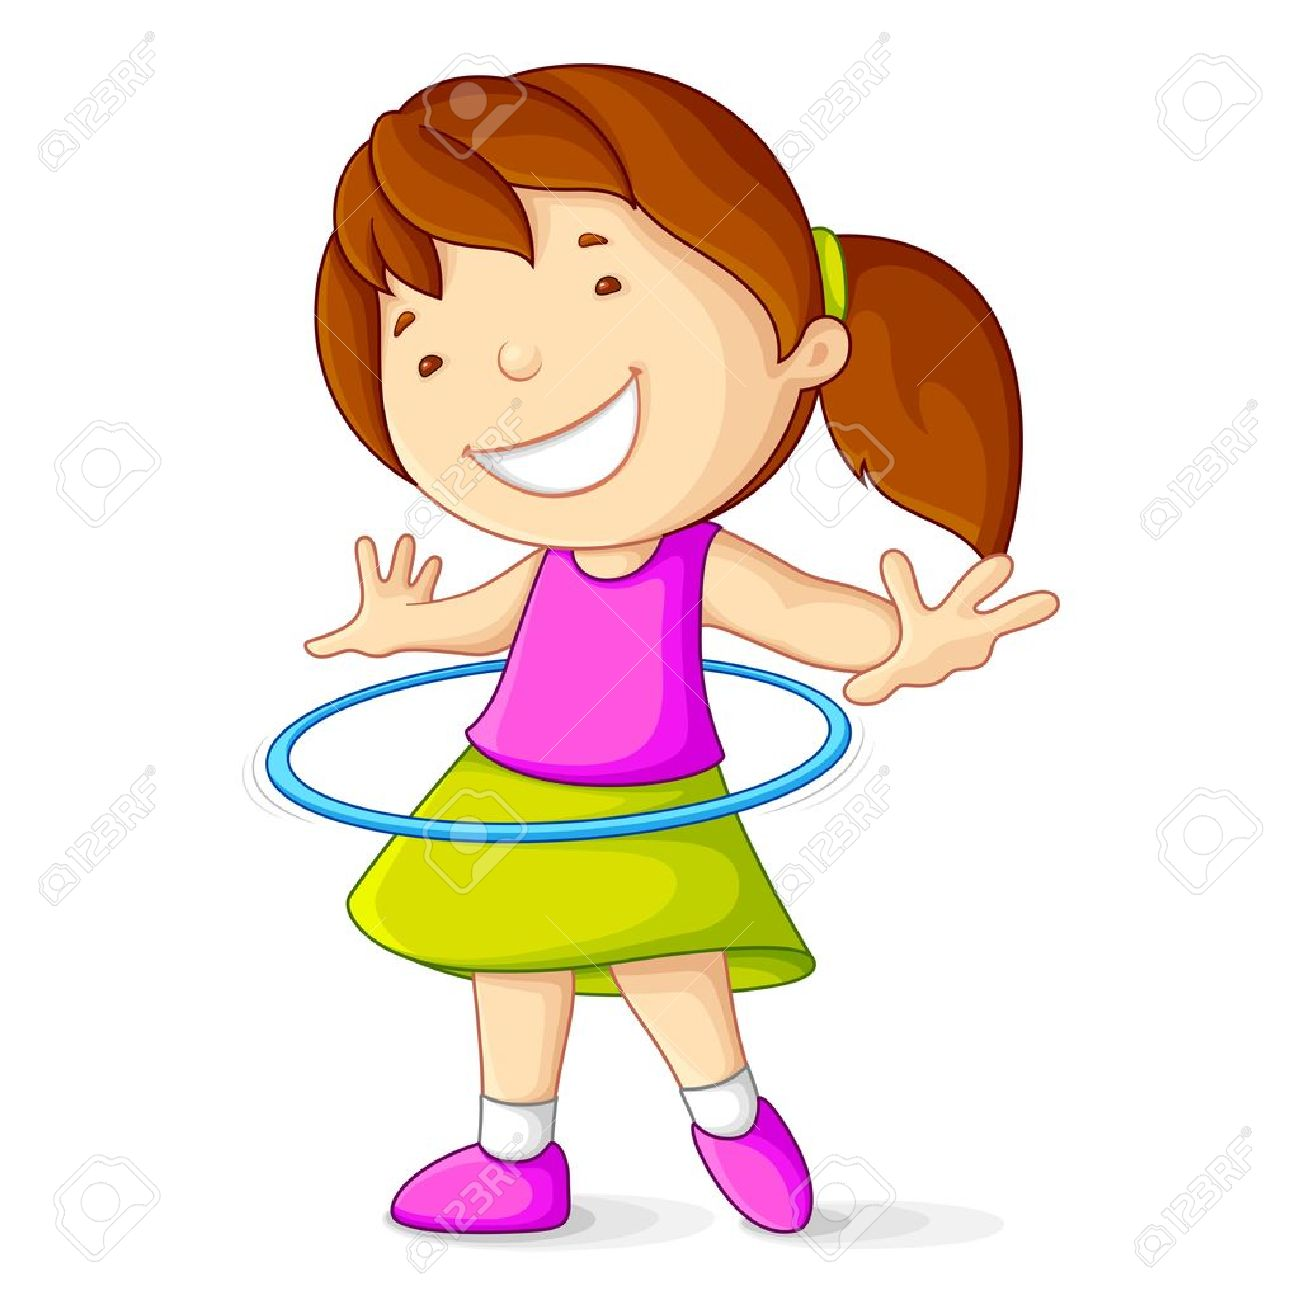 Girl Playing with Hula Hoop Stock Vector - 14315261